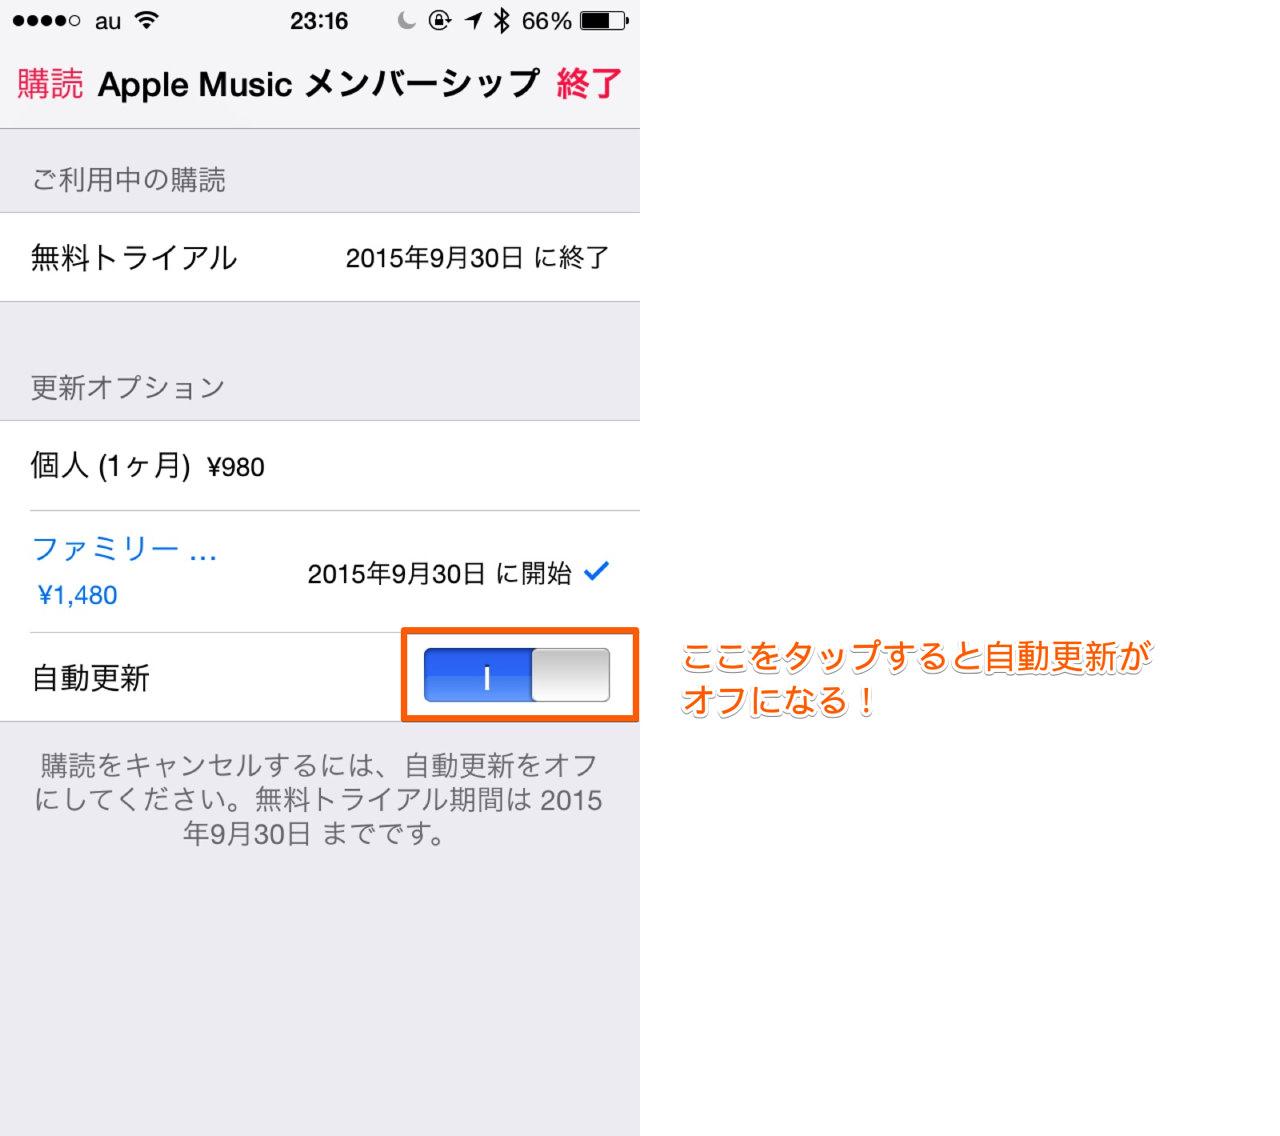 「Apple Music」の自動更新を解除する